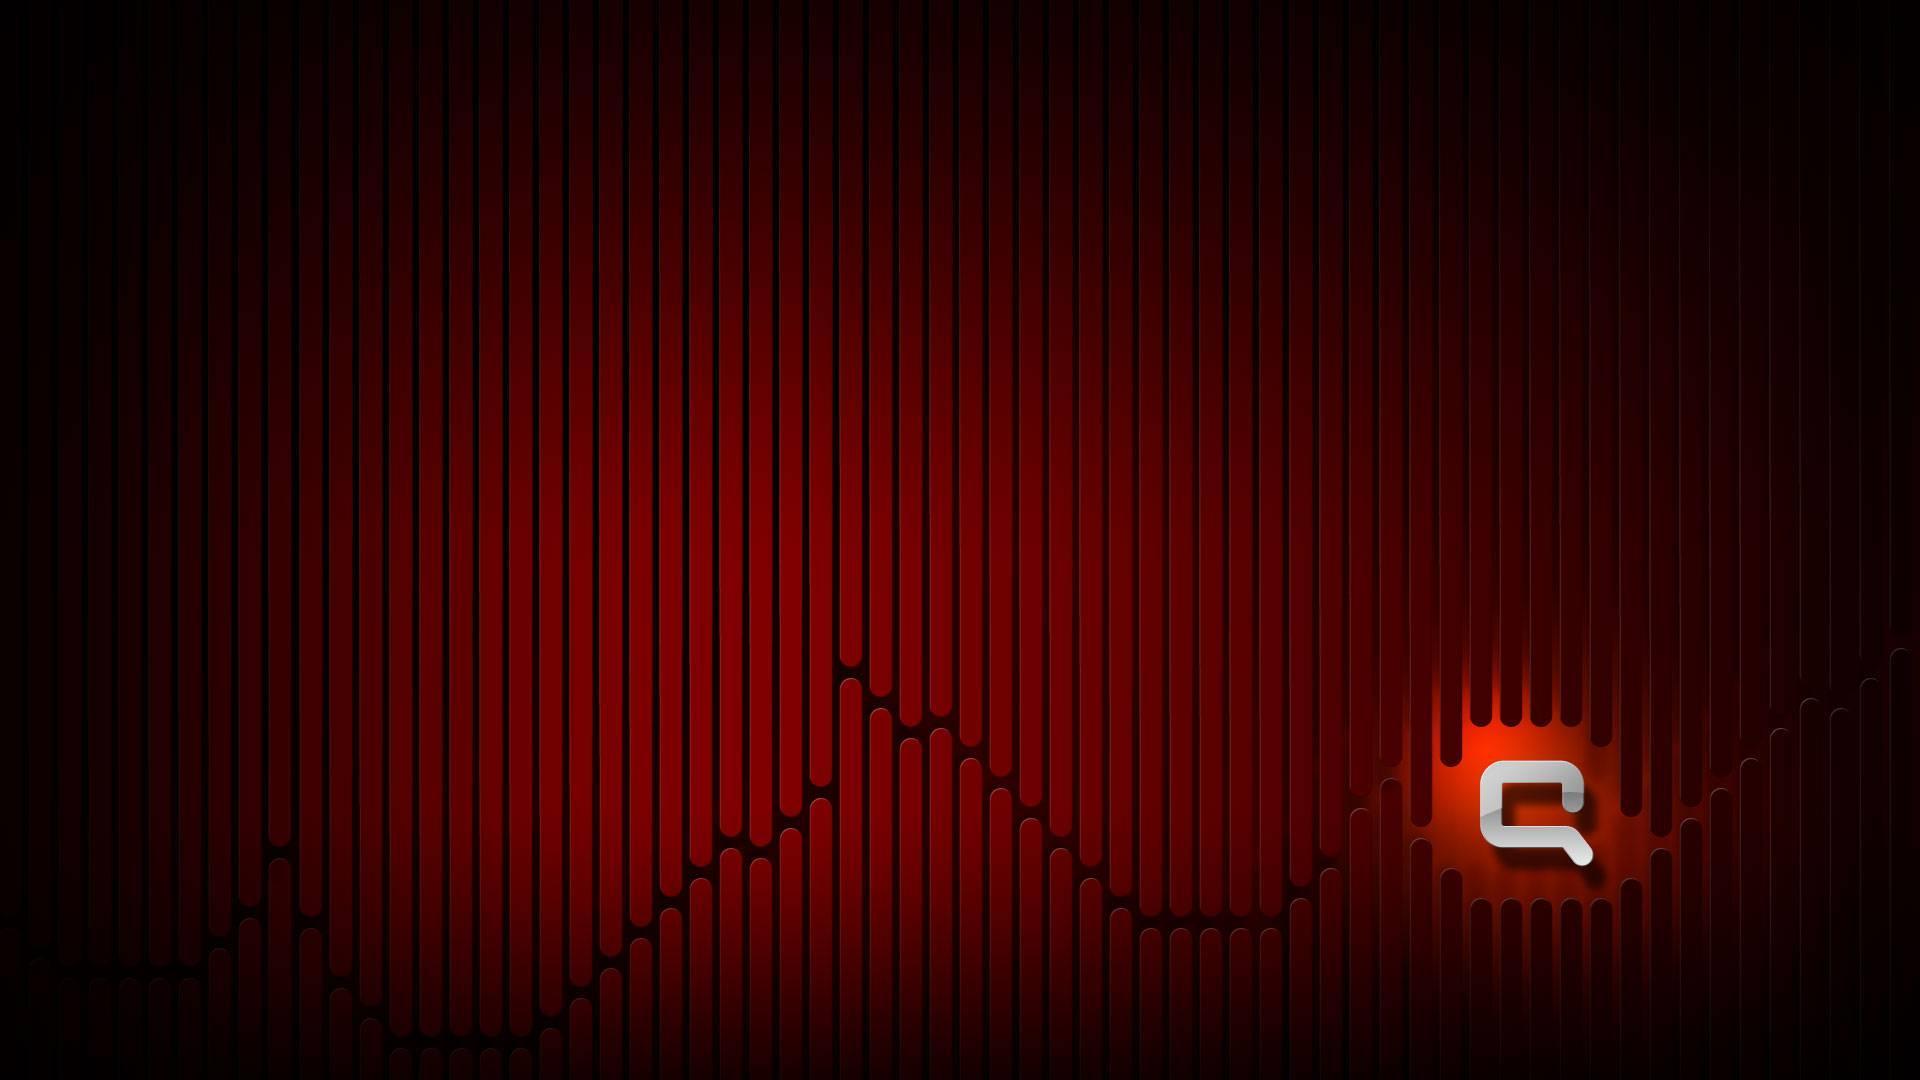 Compaq hd wallpaper widescreen wallpapersafari - Hp screensaver ...